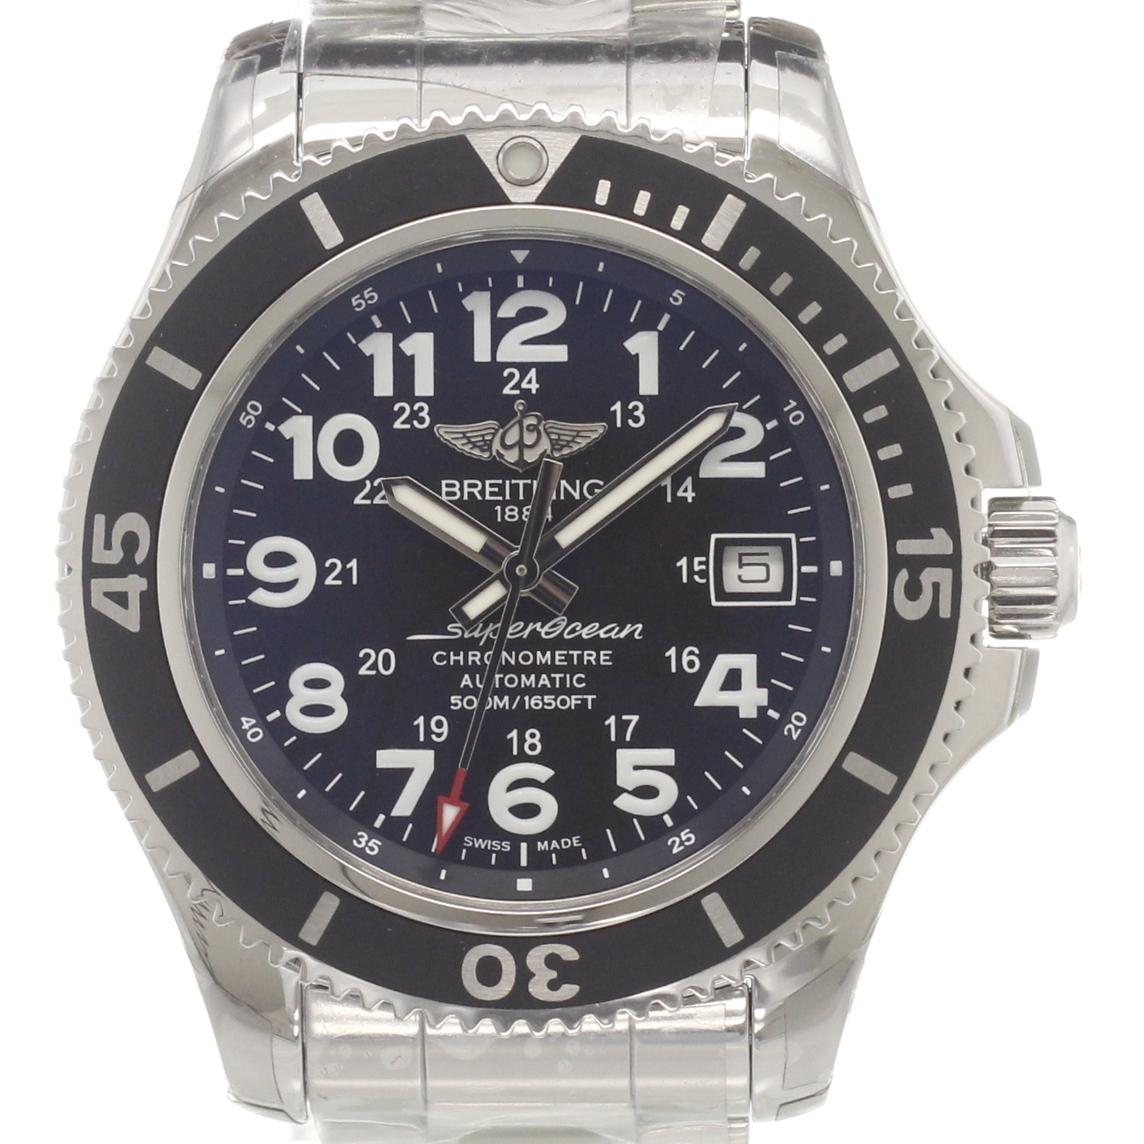 Armbanduhr breitling  Breitling Superocean II 42 A17365C9.BD67.161A kaufen | CHRONEXT